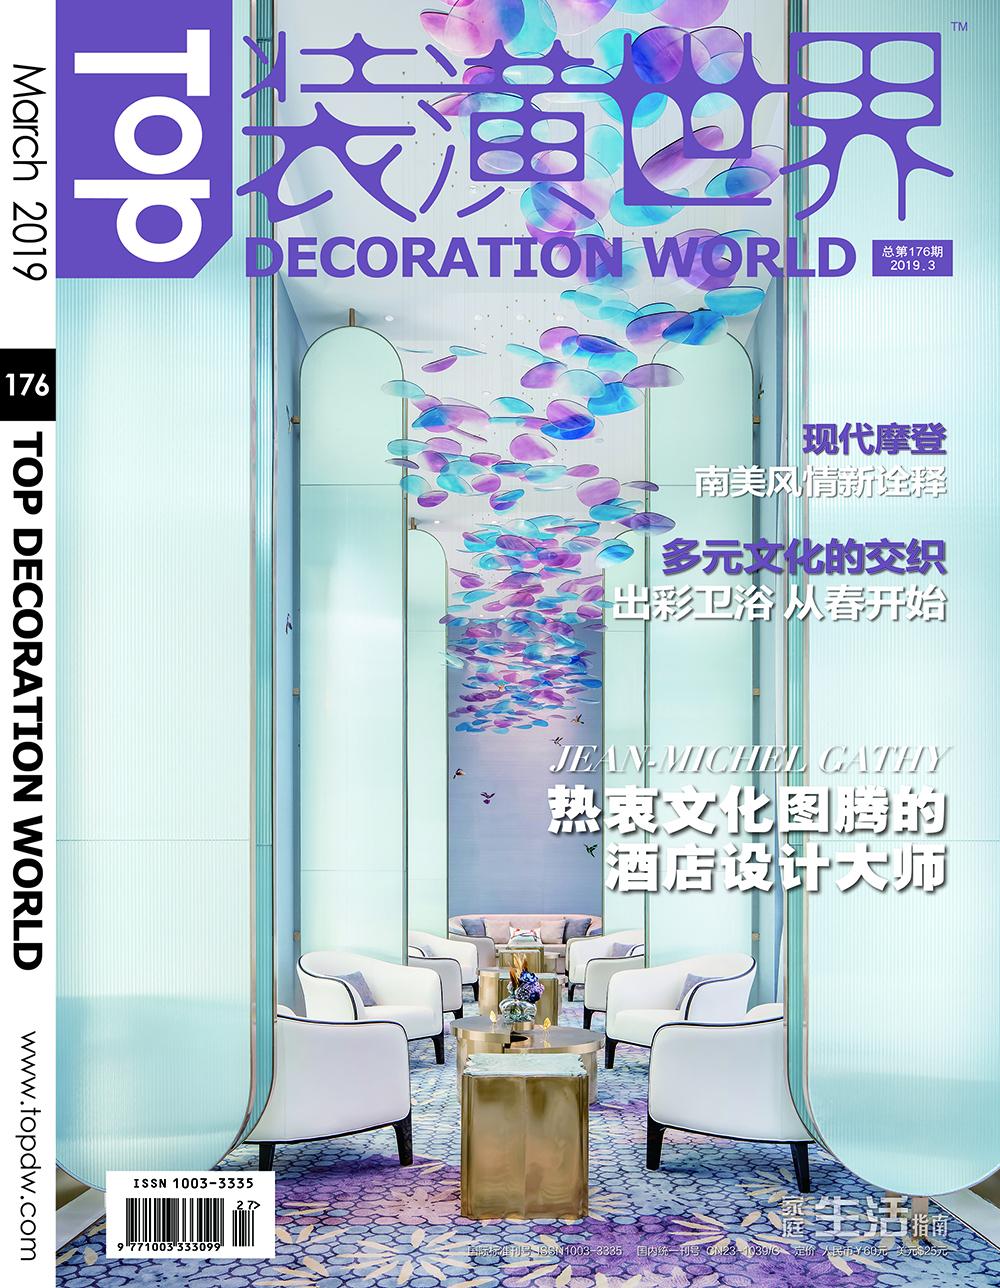 Top Decoration World